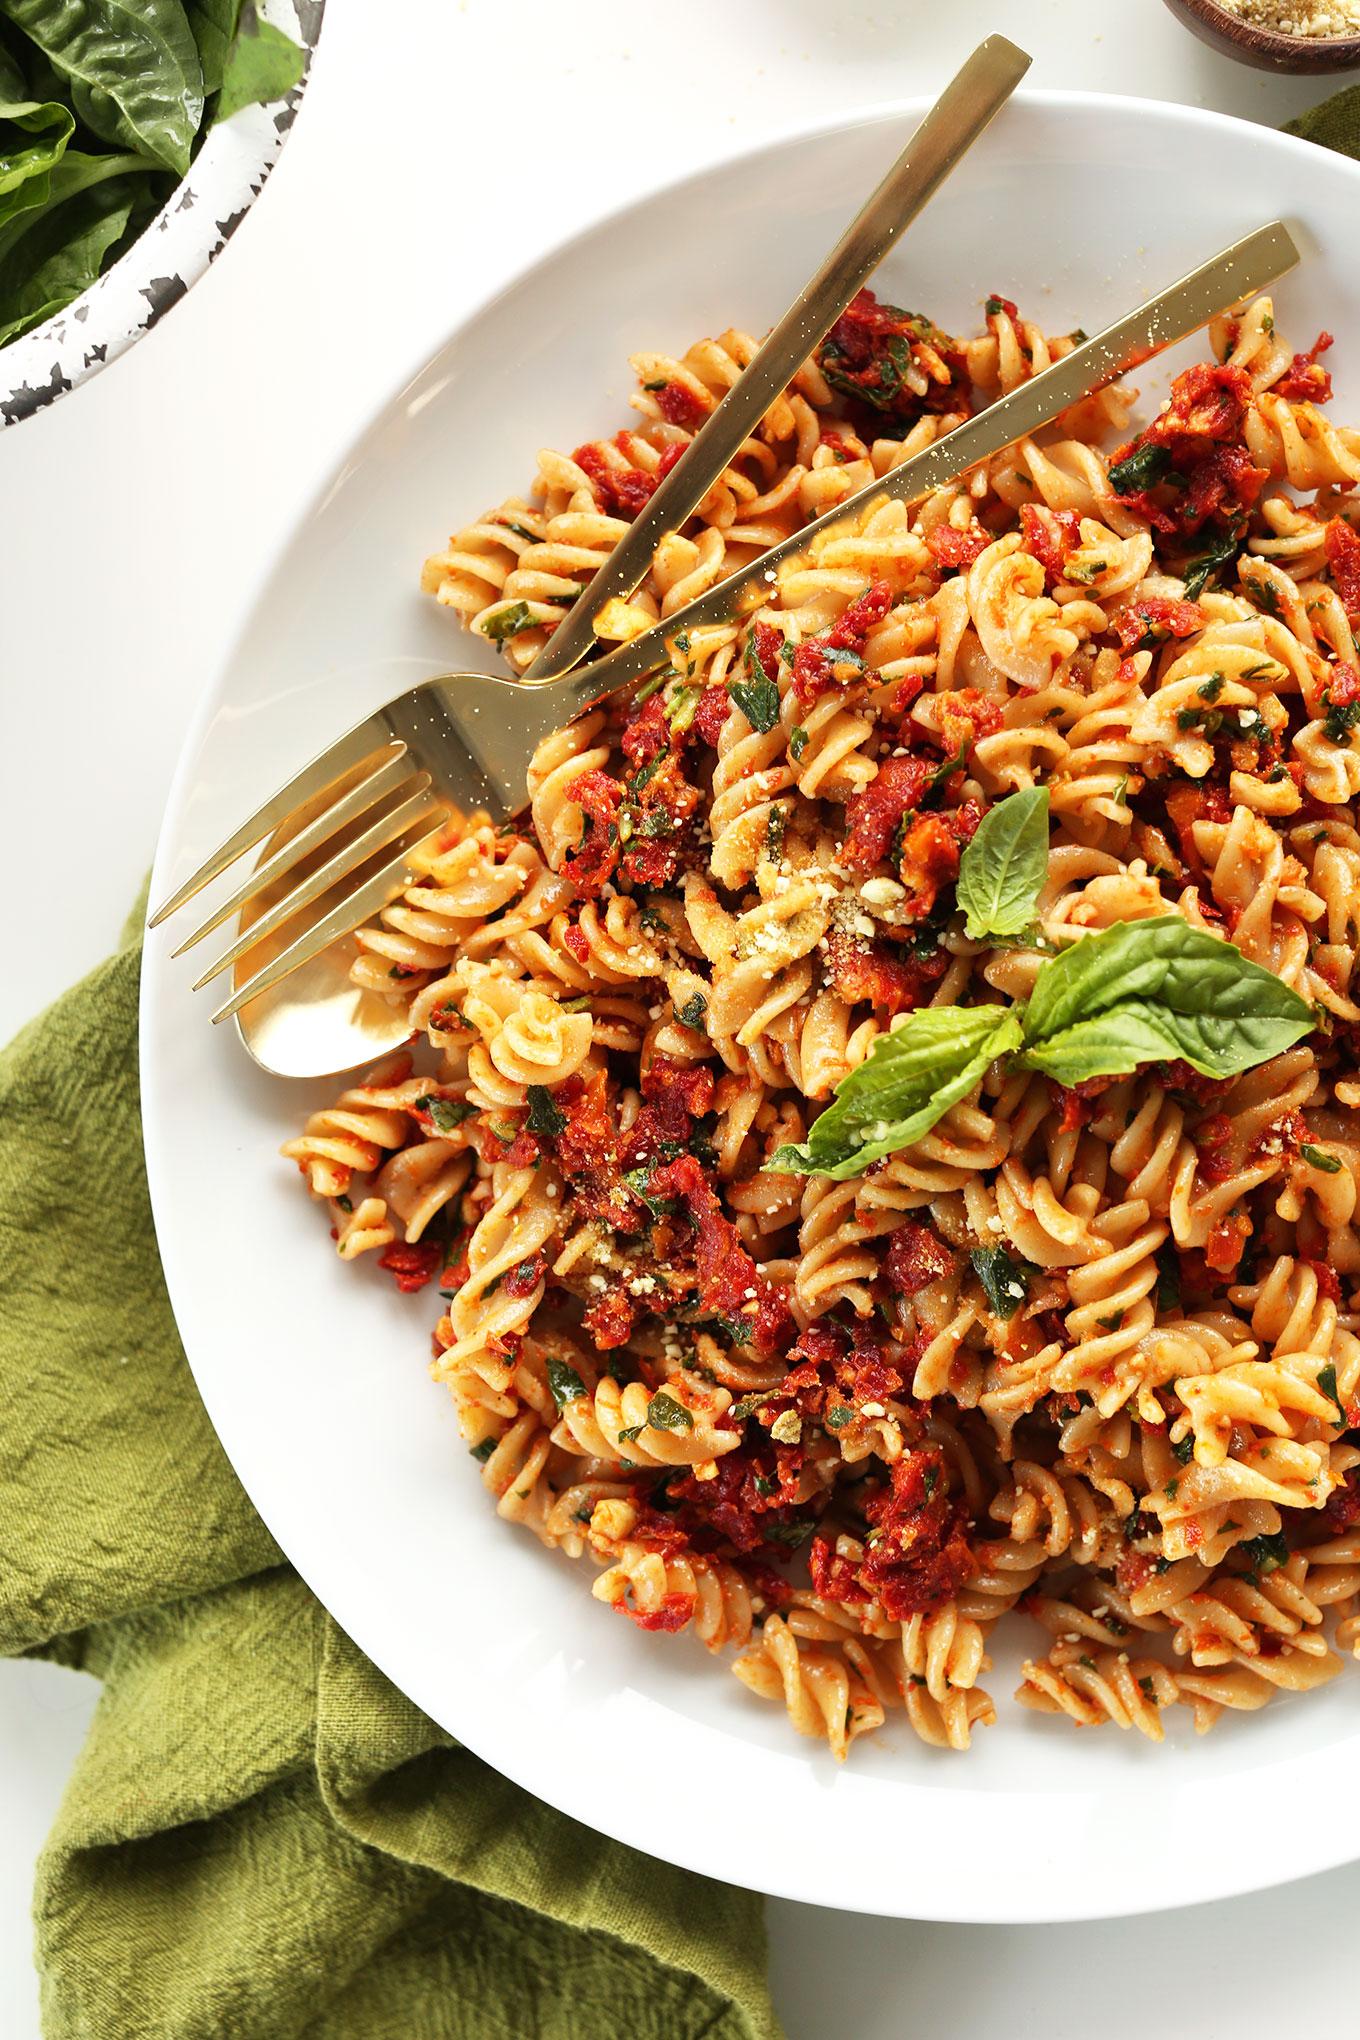 AMAZING 6-Ingredient Sun-Dried Tomato PESTO Pasta! 6 ingredients, 20 minutes, SO delicious and healthy! #vegan #glutenfree #pasta #minimalistbaker